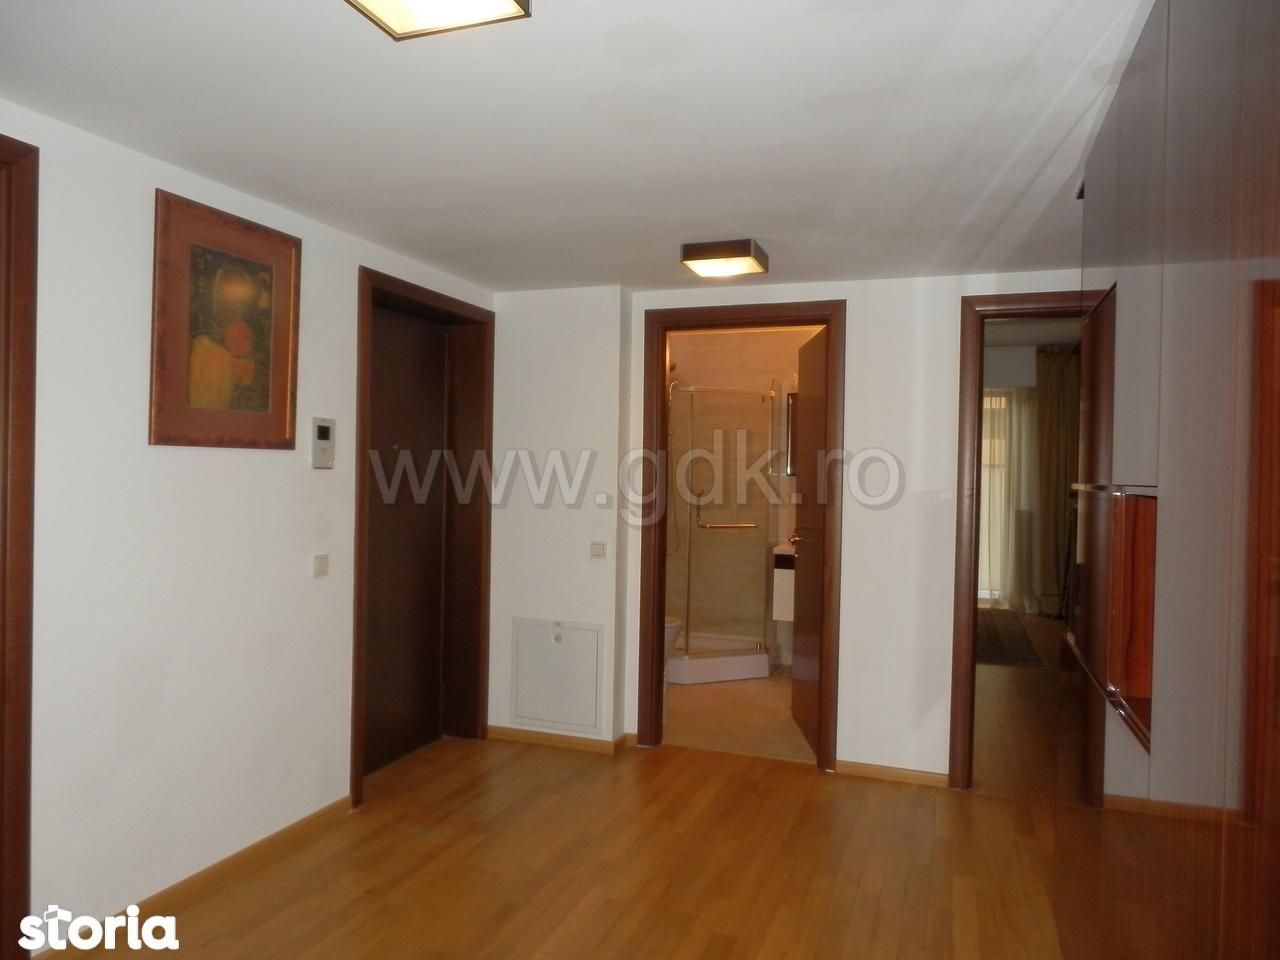 Apartament de inchiriat, București (judet), Strada Gen. Av. Athanasie Enescu - Foto 8